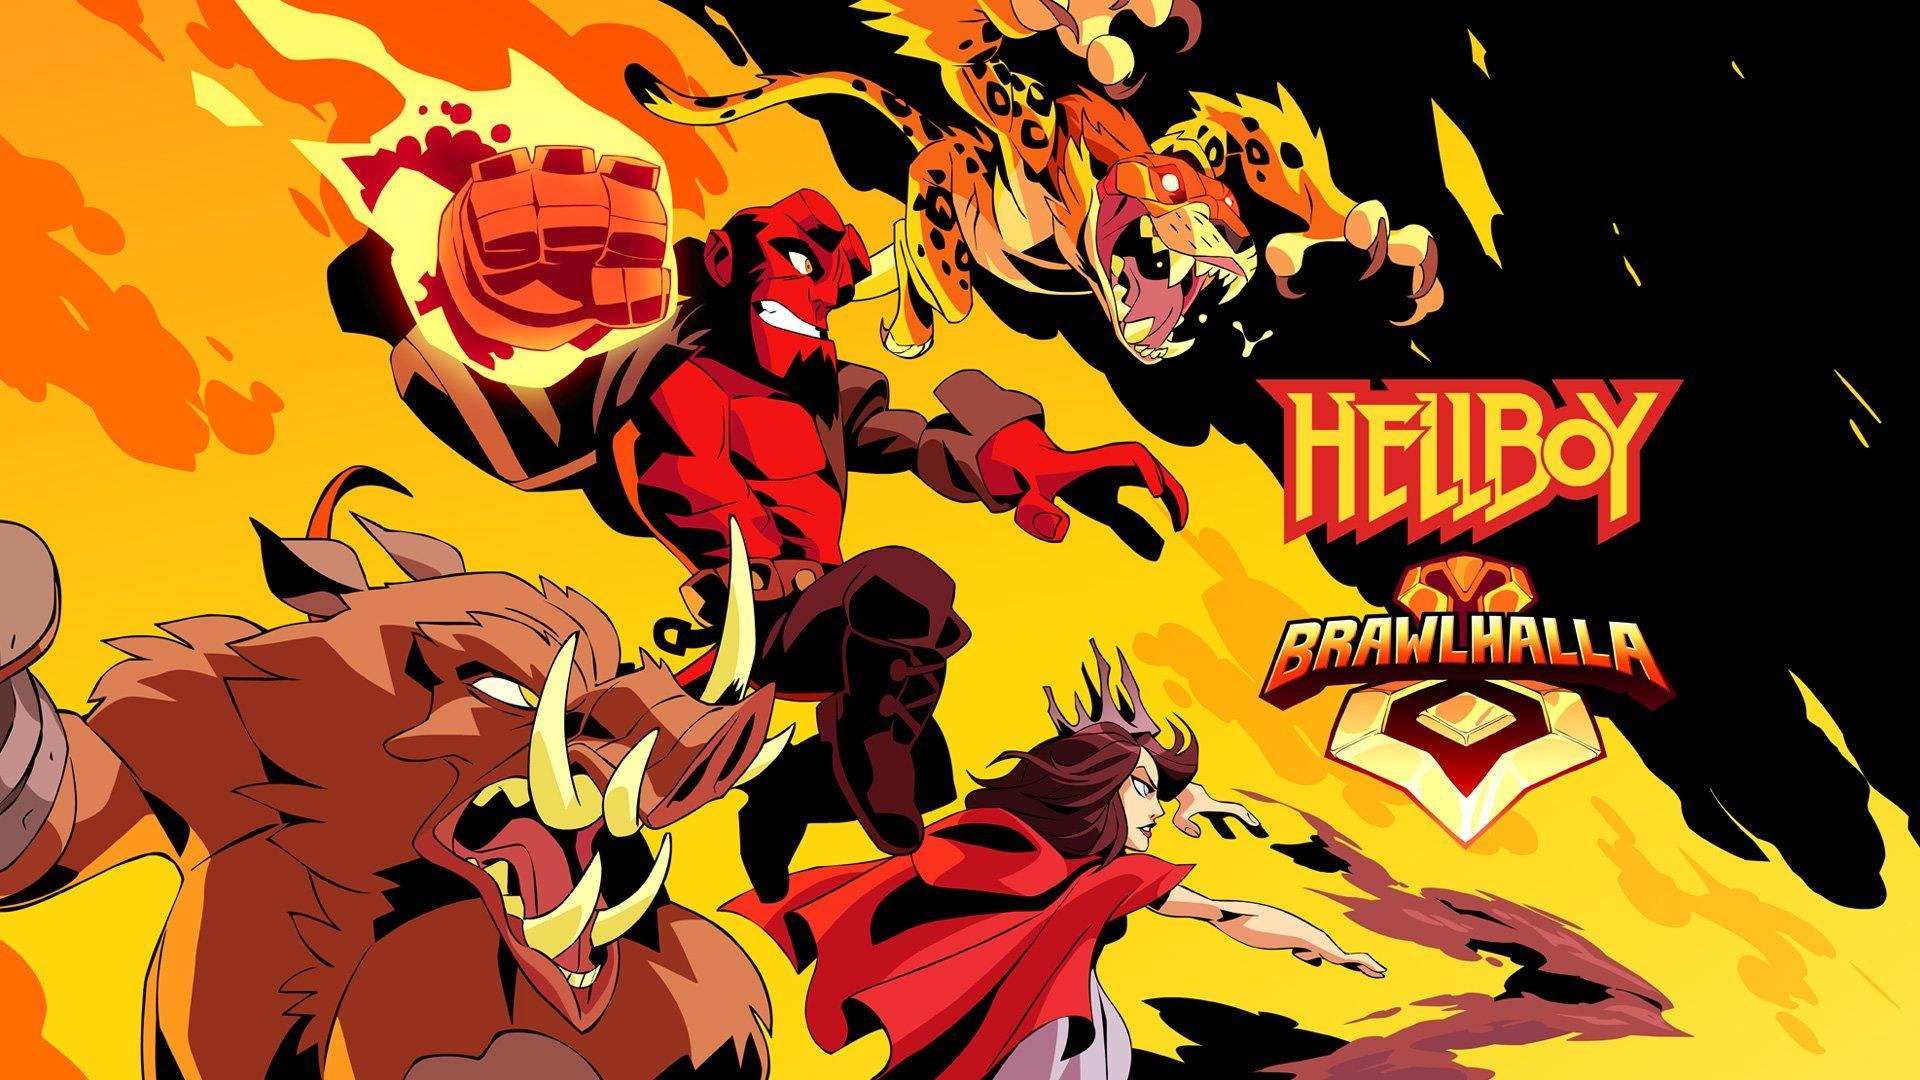 Hellboy Brawlhalla character